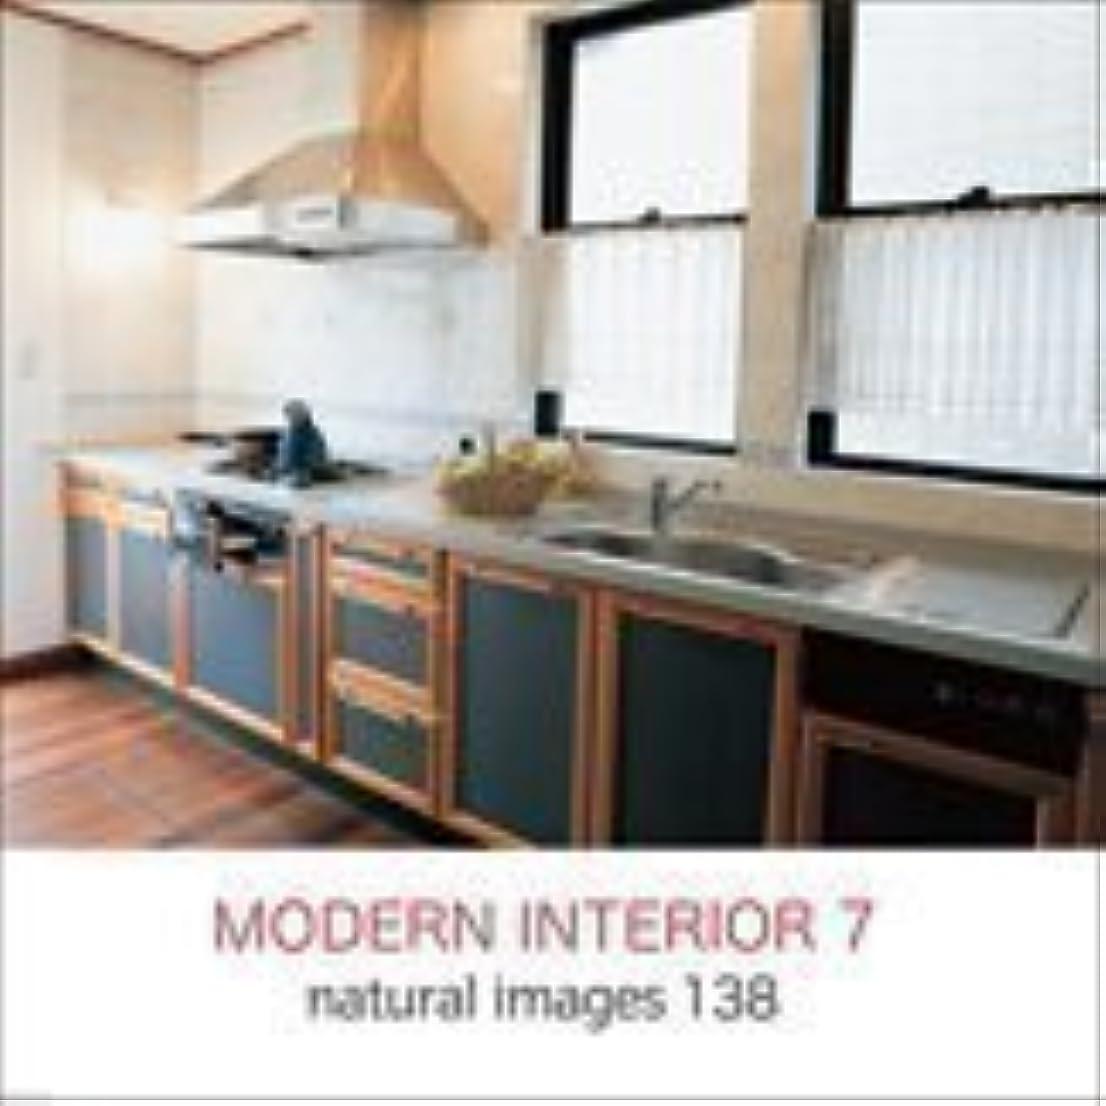 naturalimages Vol.138 MODERN INTERIOR 7